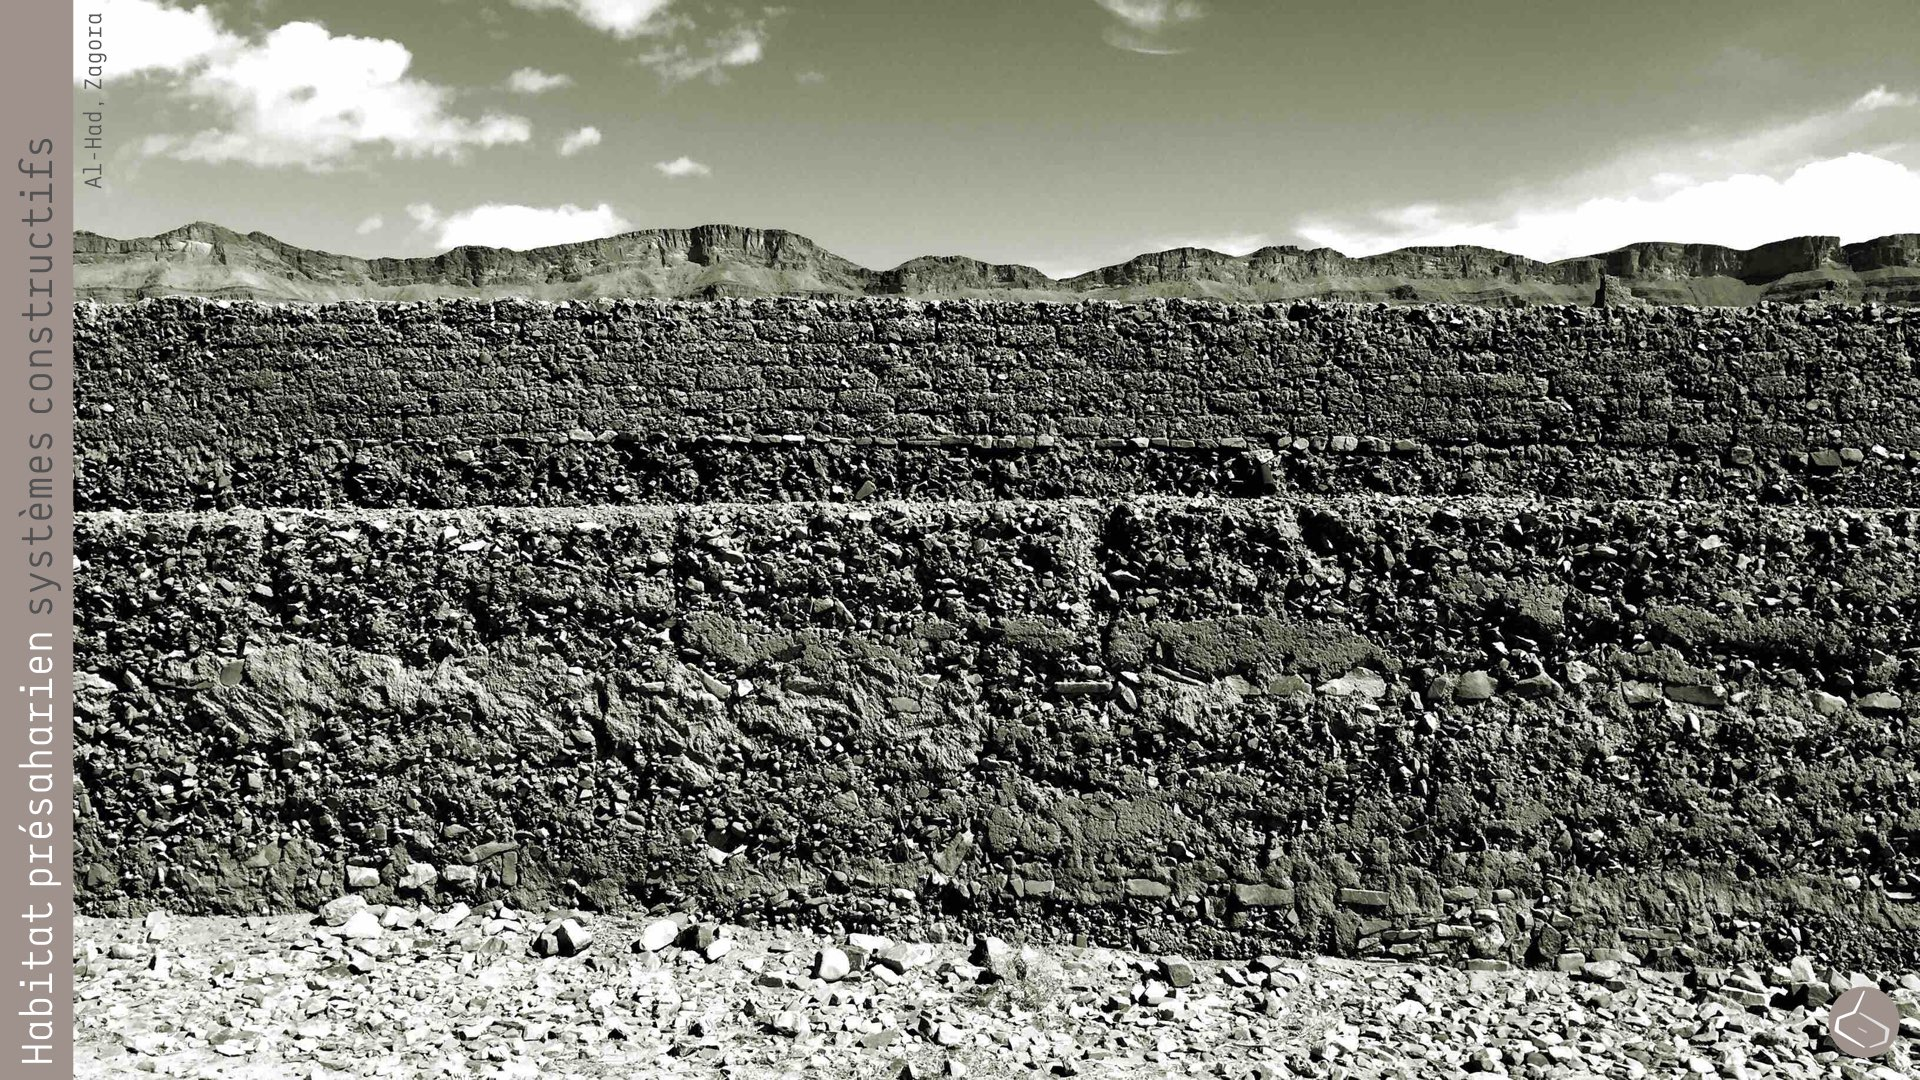 55. Sauf le règlement parasismique il n'y a pas d'autres règlements qui puissent aider à mieux construire ou réhabiliter en terre.       55. Unless the seismic regulation, there are no other regulations that can help better build or rehabilitate in rammed earth.